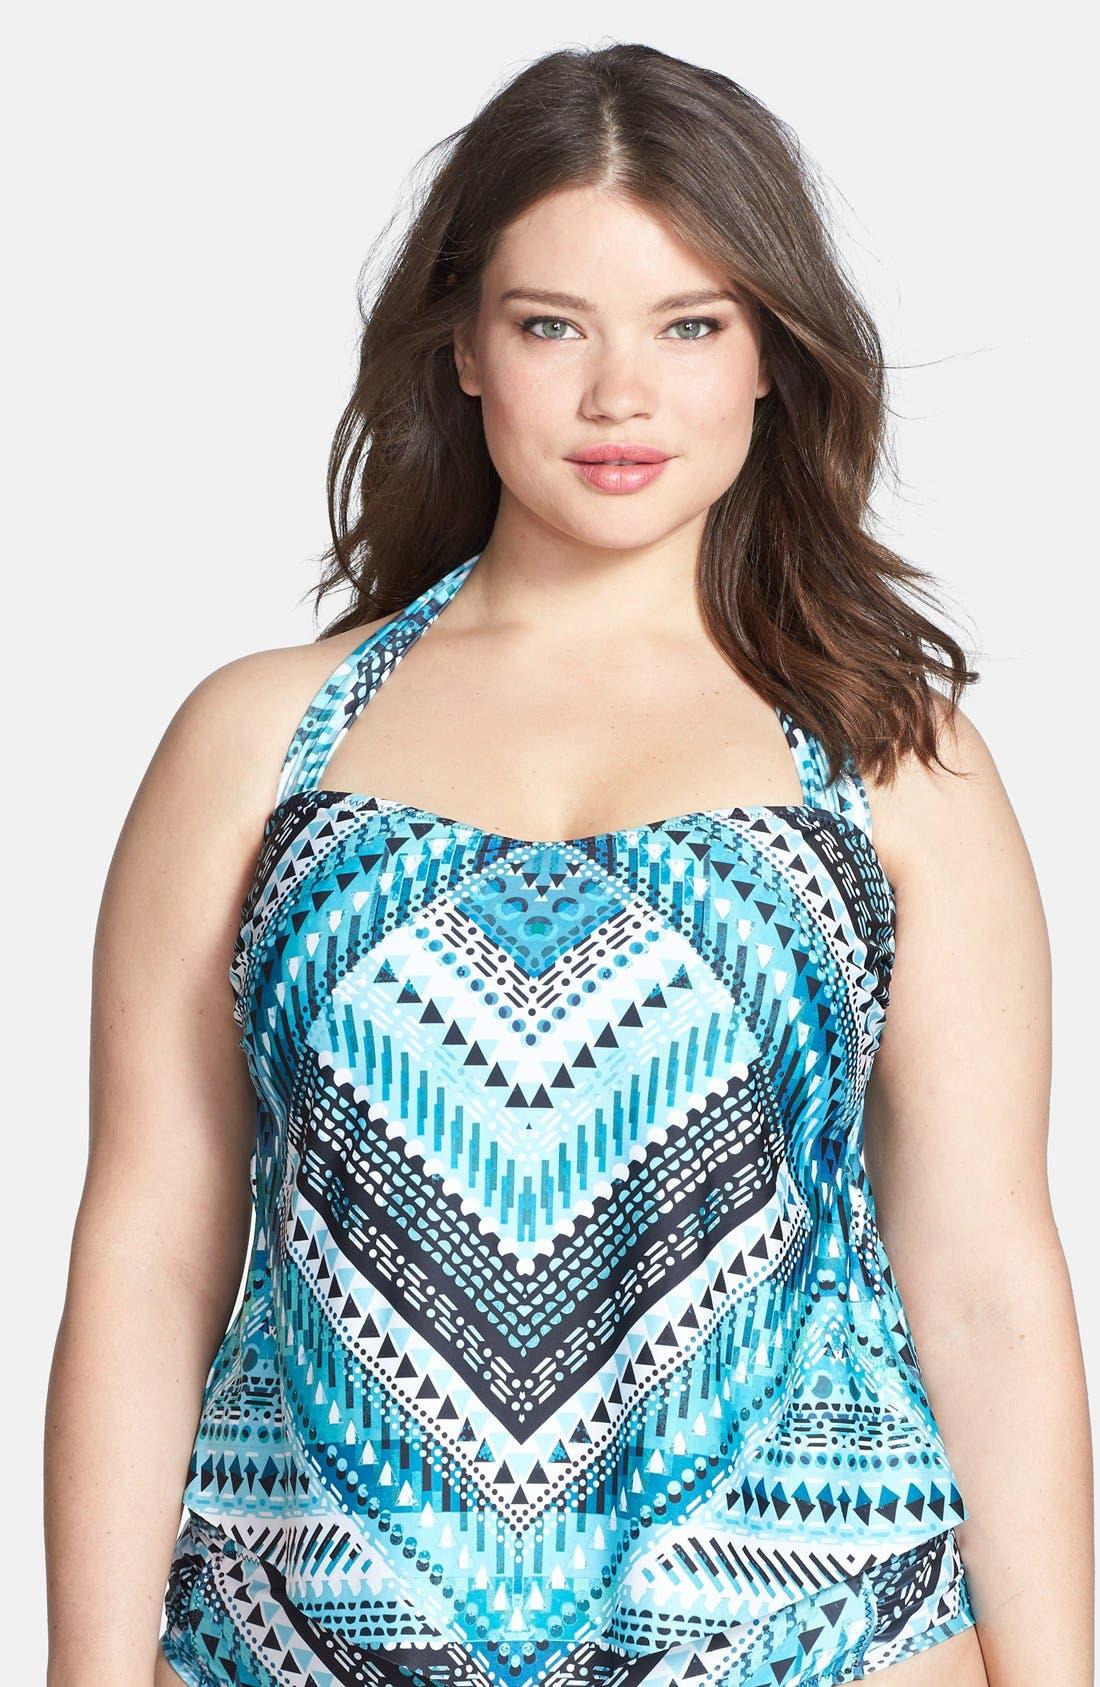 Alternate Image 1 Selected - Becca Etc. 'Mayan' Tankini Top (Plus Size)